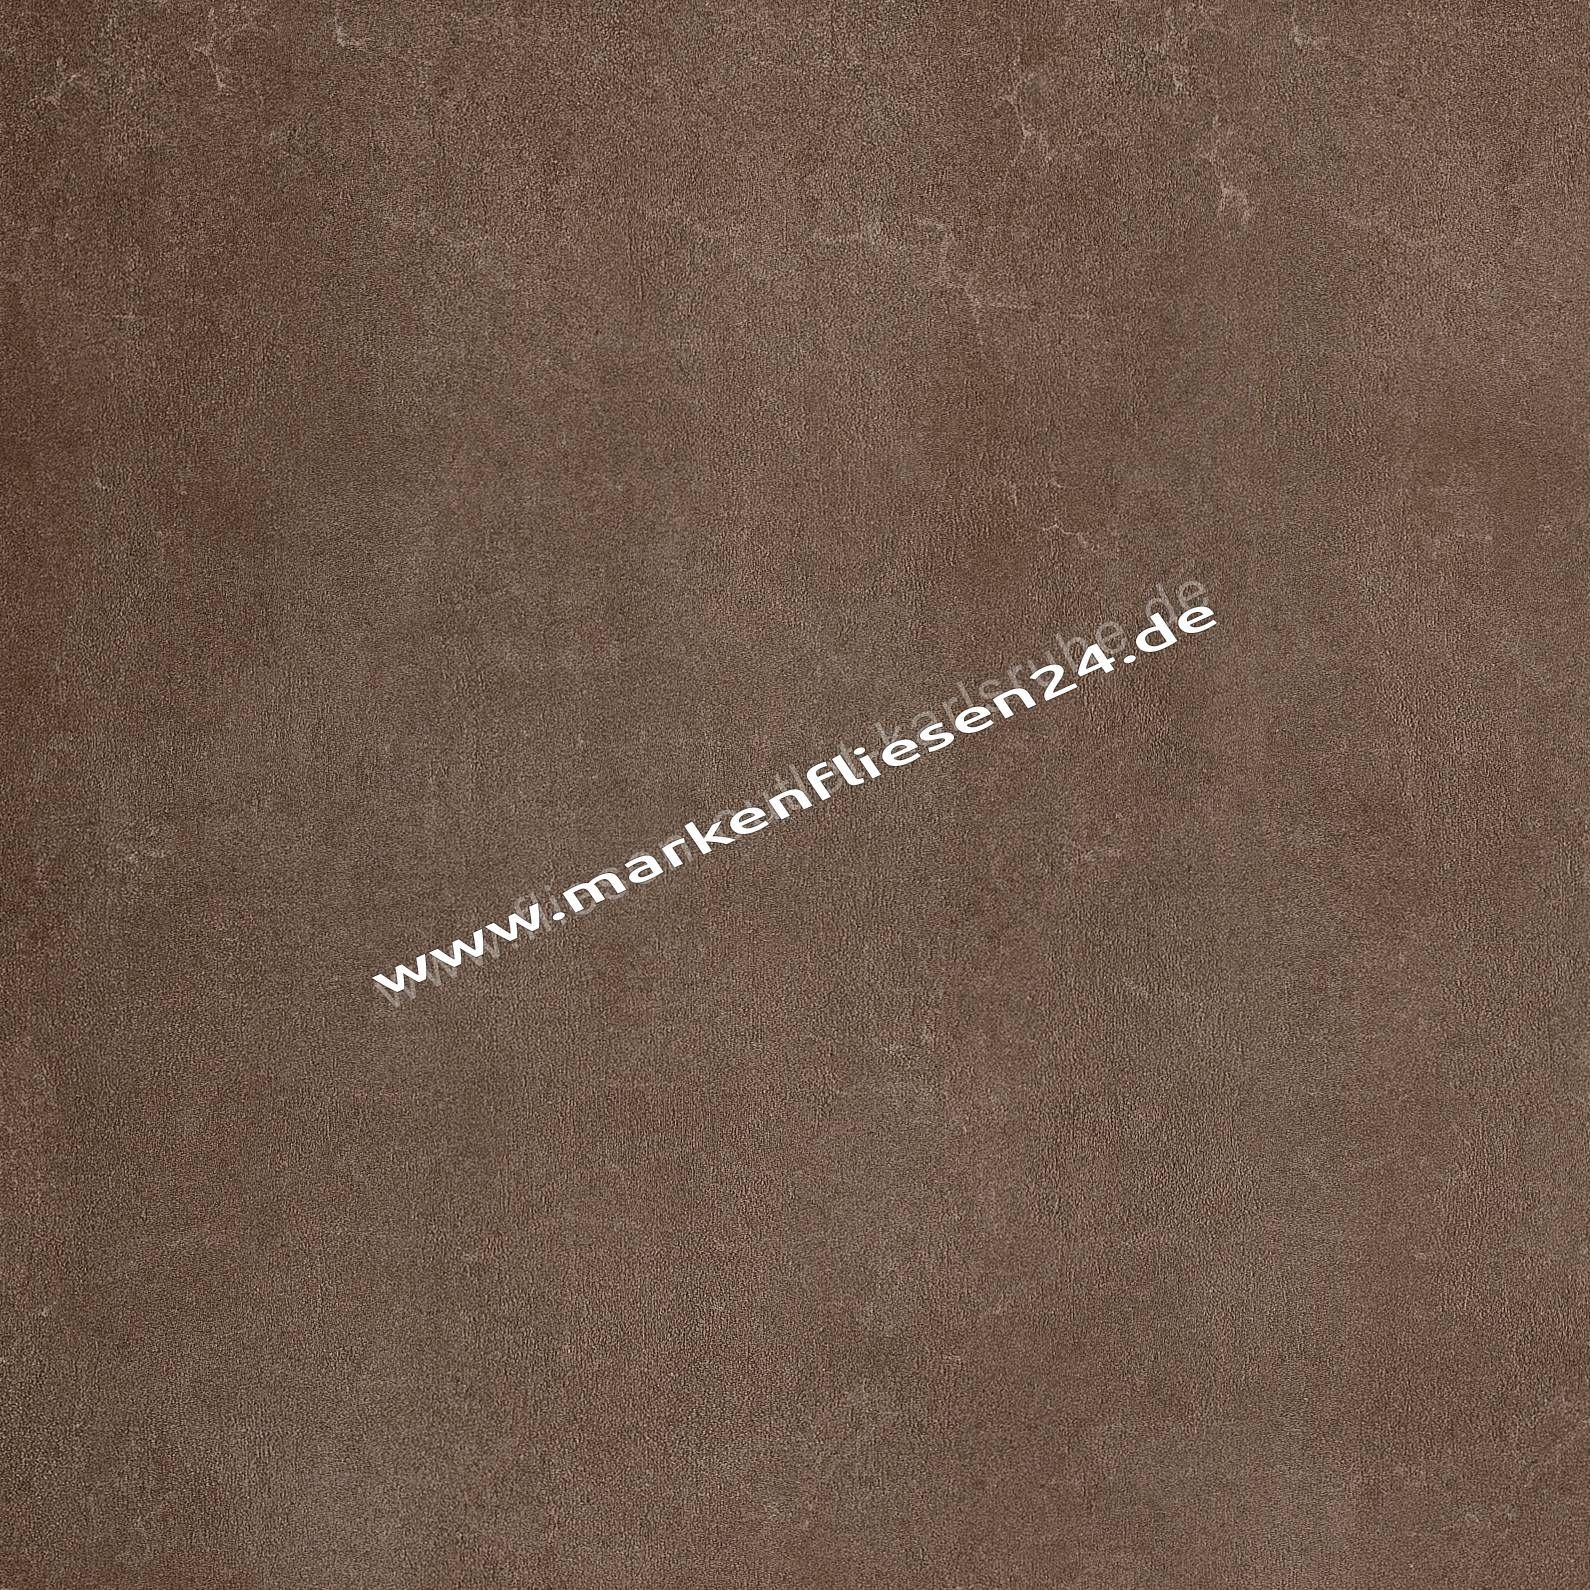 floorgres serie industrial 120x120 cm g nstig online kaufen fliesen outlet. Black Bedroom Furniture Sets. Home Design Ideas